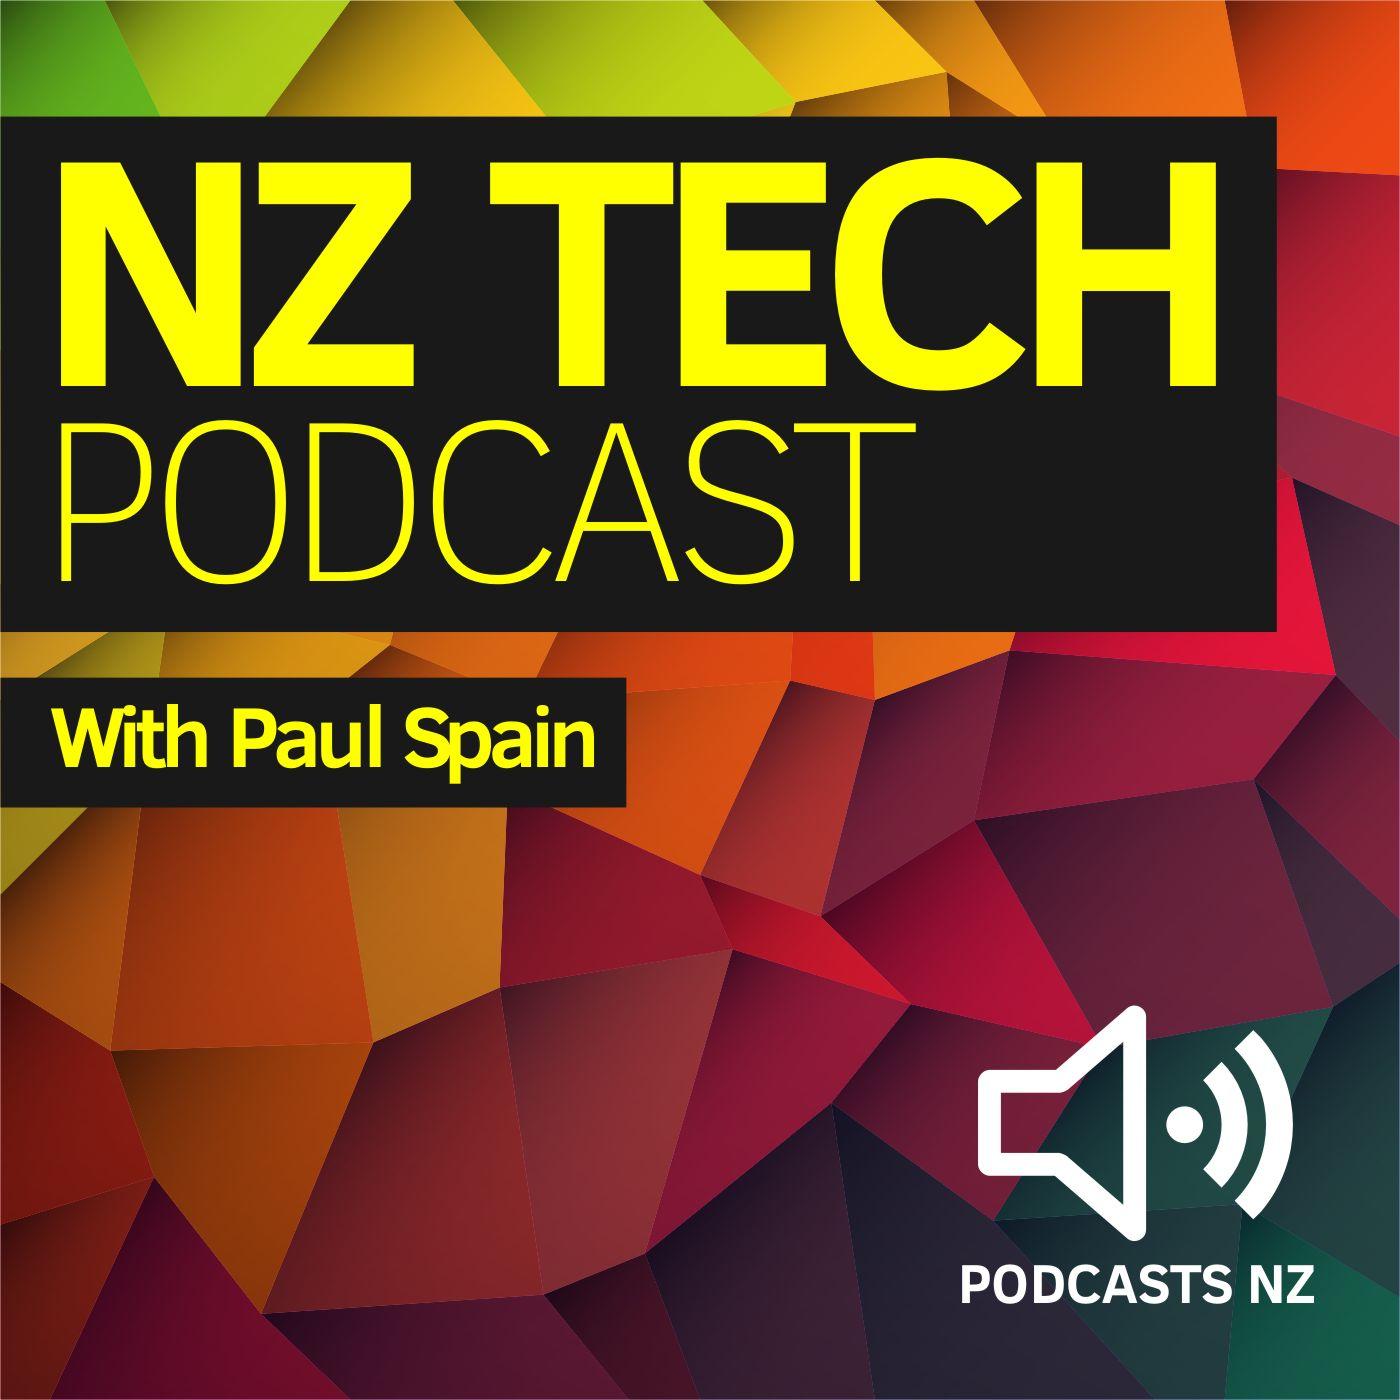 NZ Tech Podcast 265: Netflix vs Proxies, Cheap Fast 4G Broadband